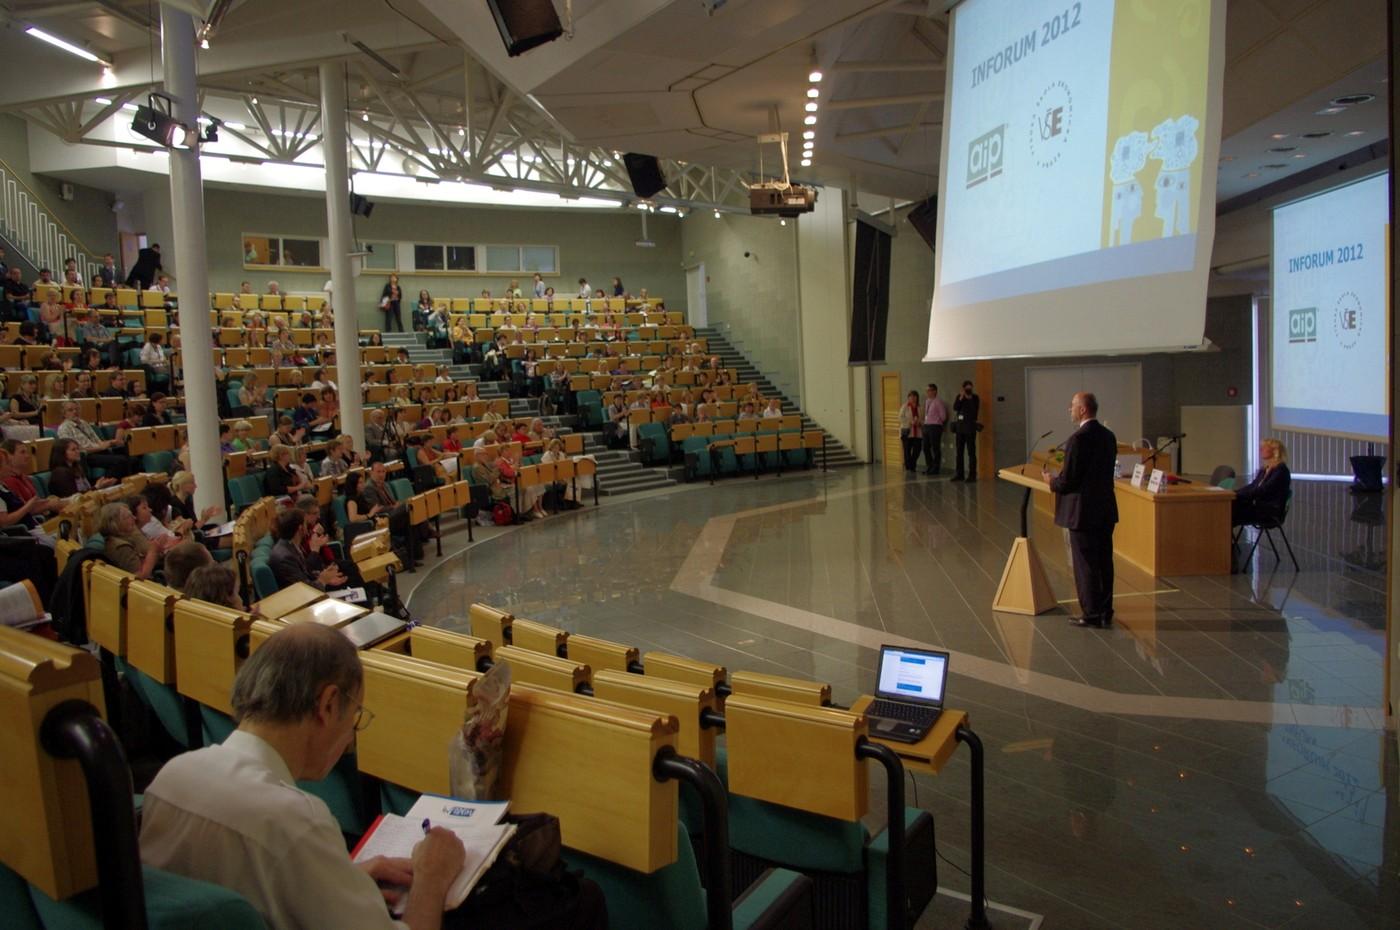 Vladimír Karen zahajuje 18. ročník konference INFORUM